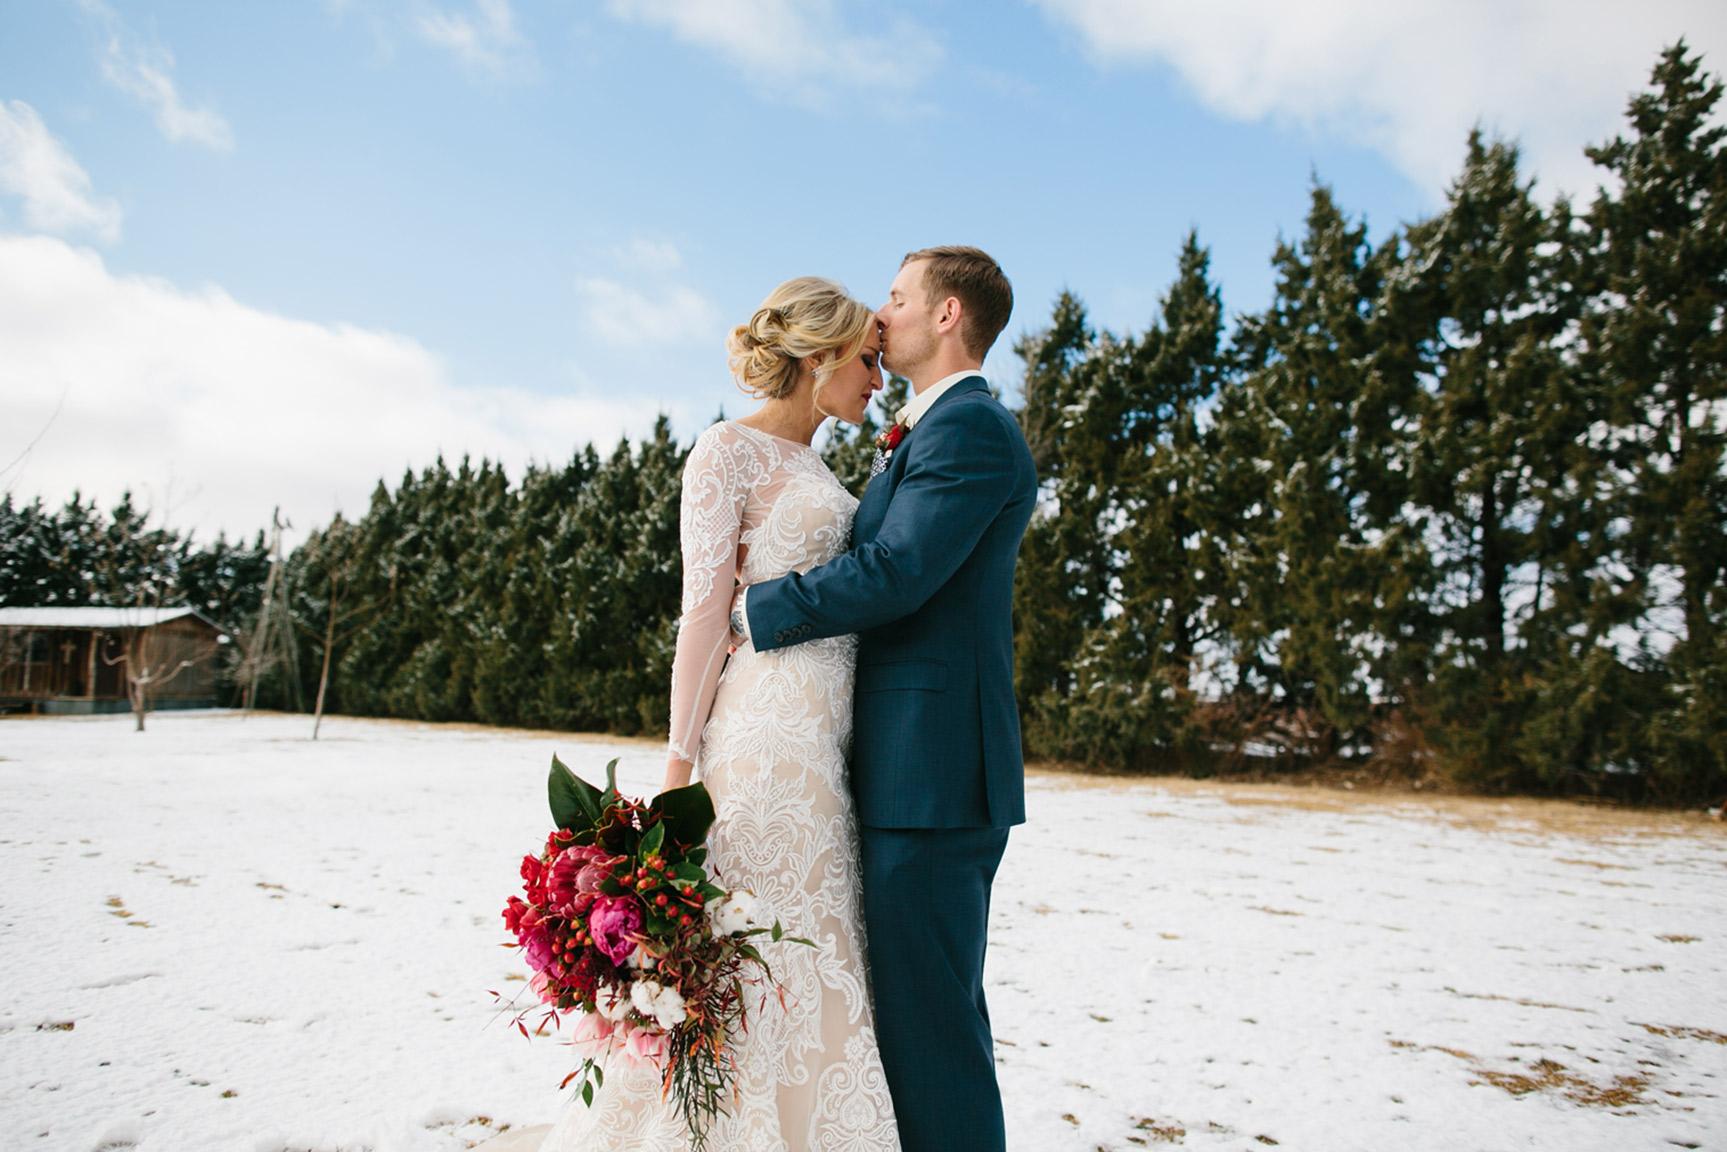 Cotton_Creek_Barn_Winter_Wedding_WeddingPhotographer027.jpg